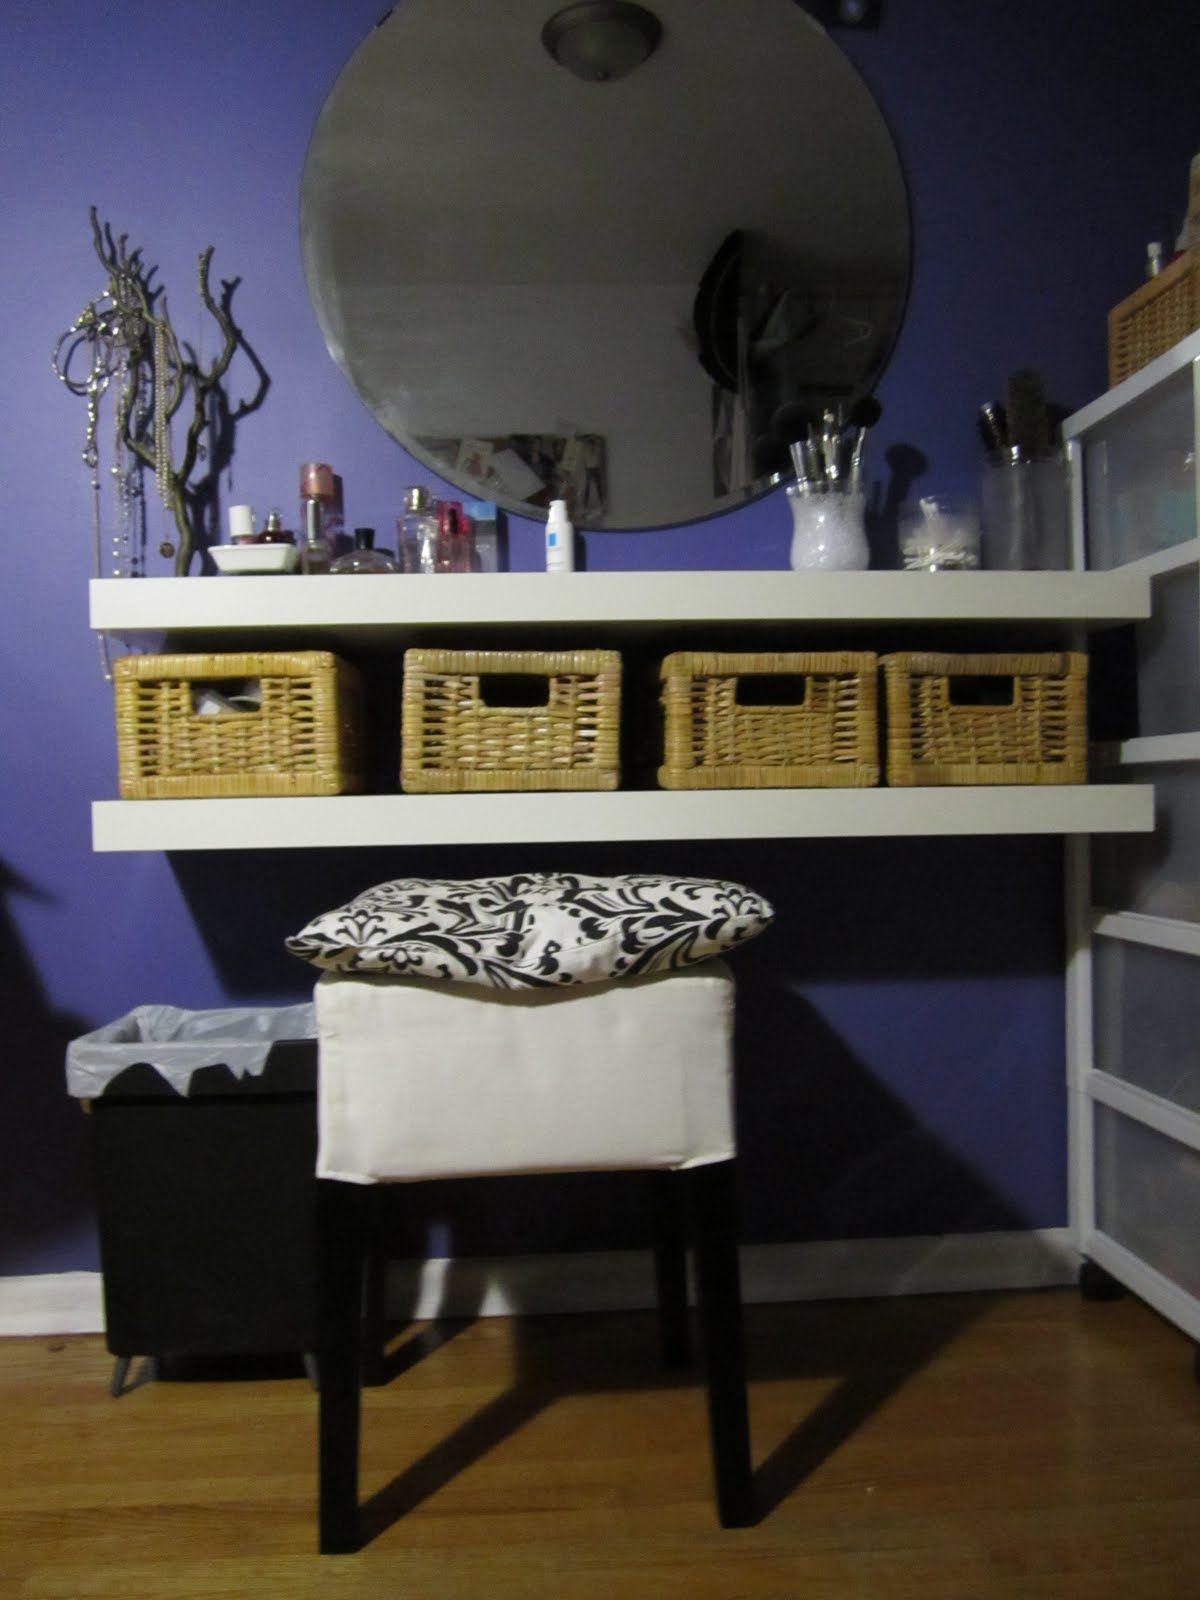 Diy Vanity Table Floating Shelves & Baskets